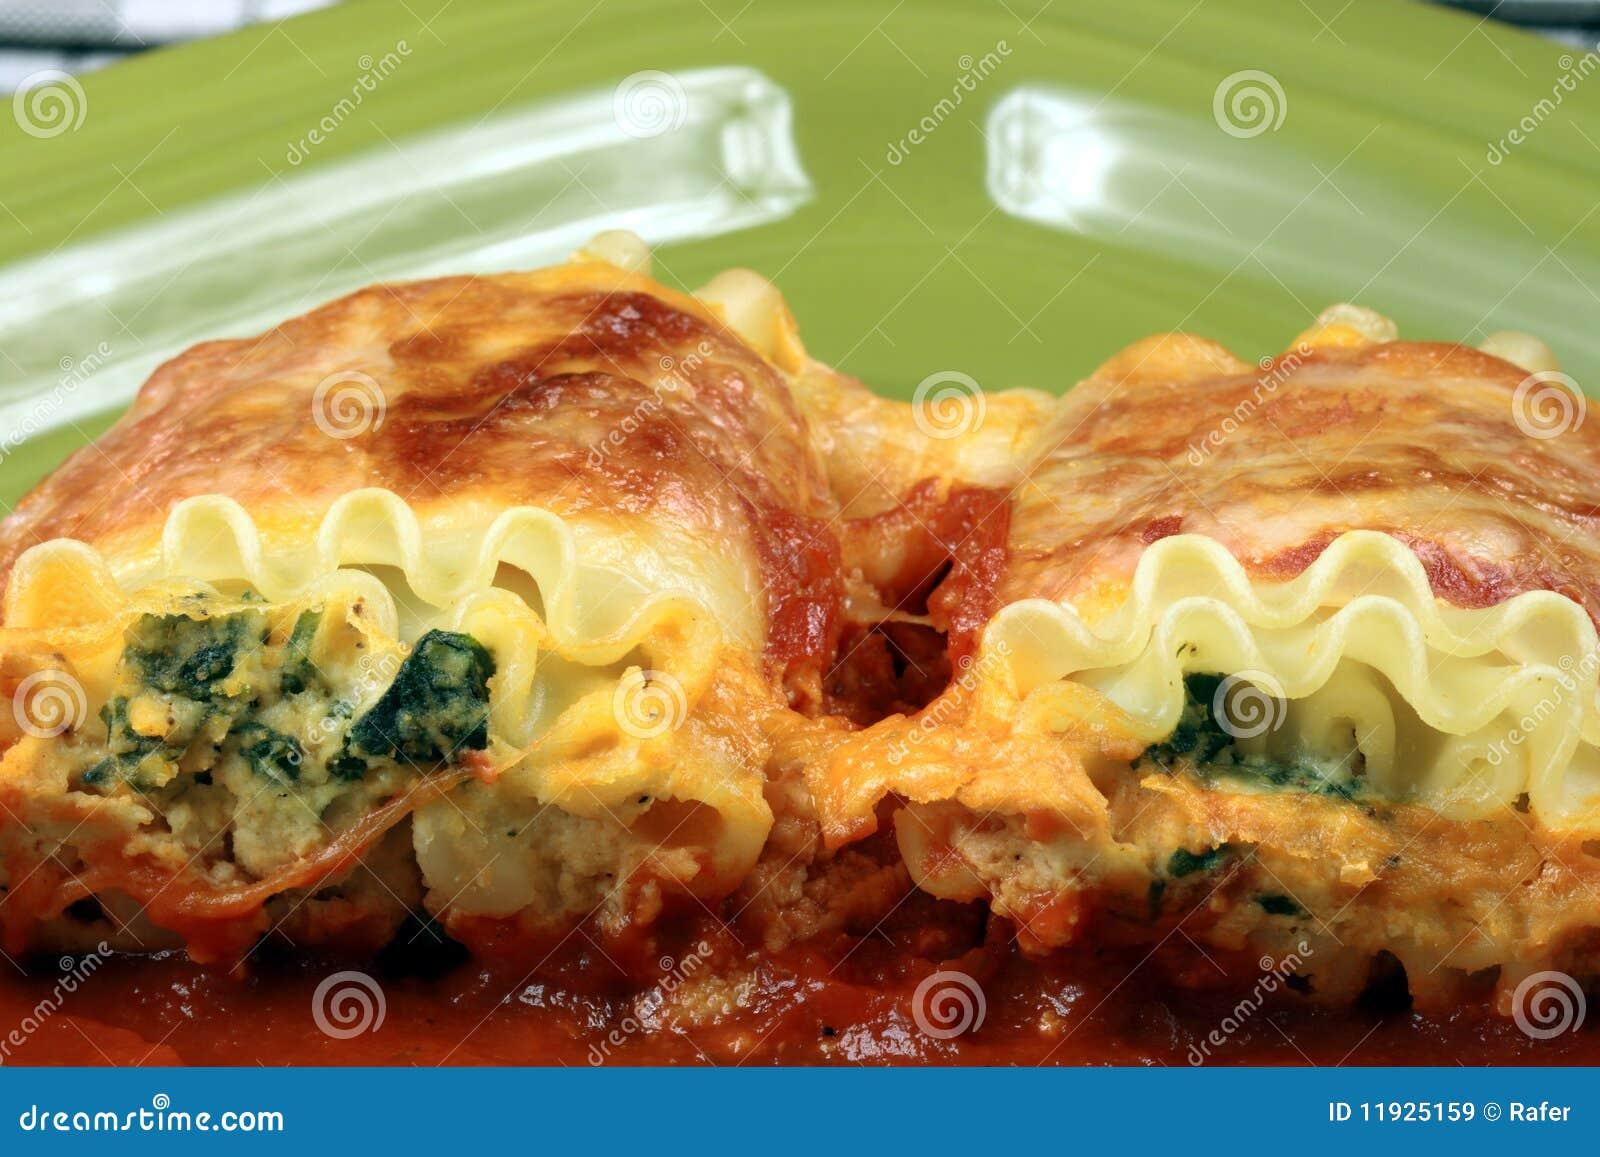 how to say lasagna in italian